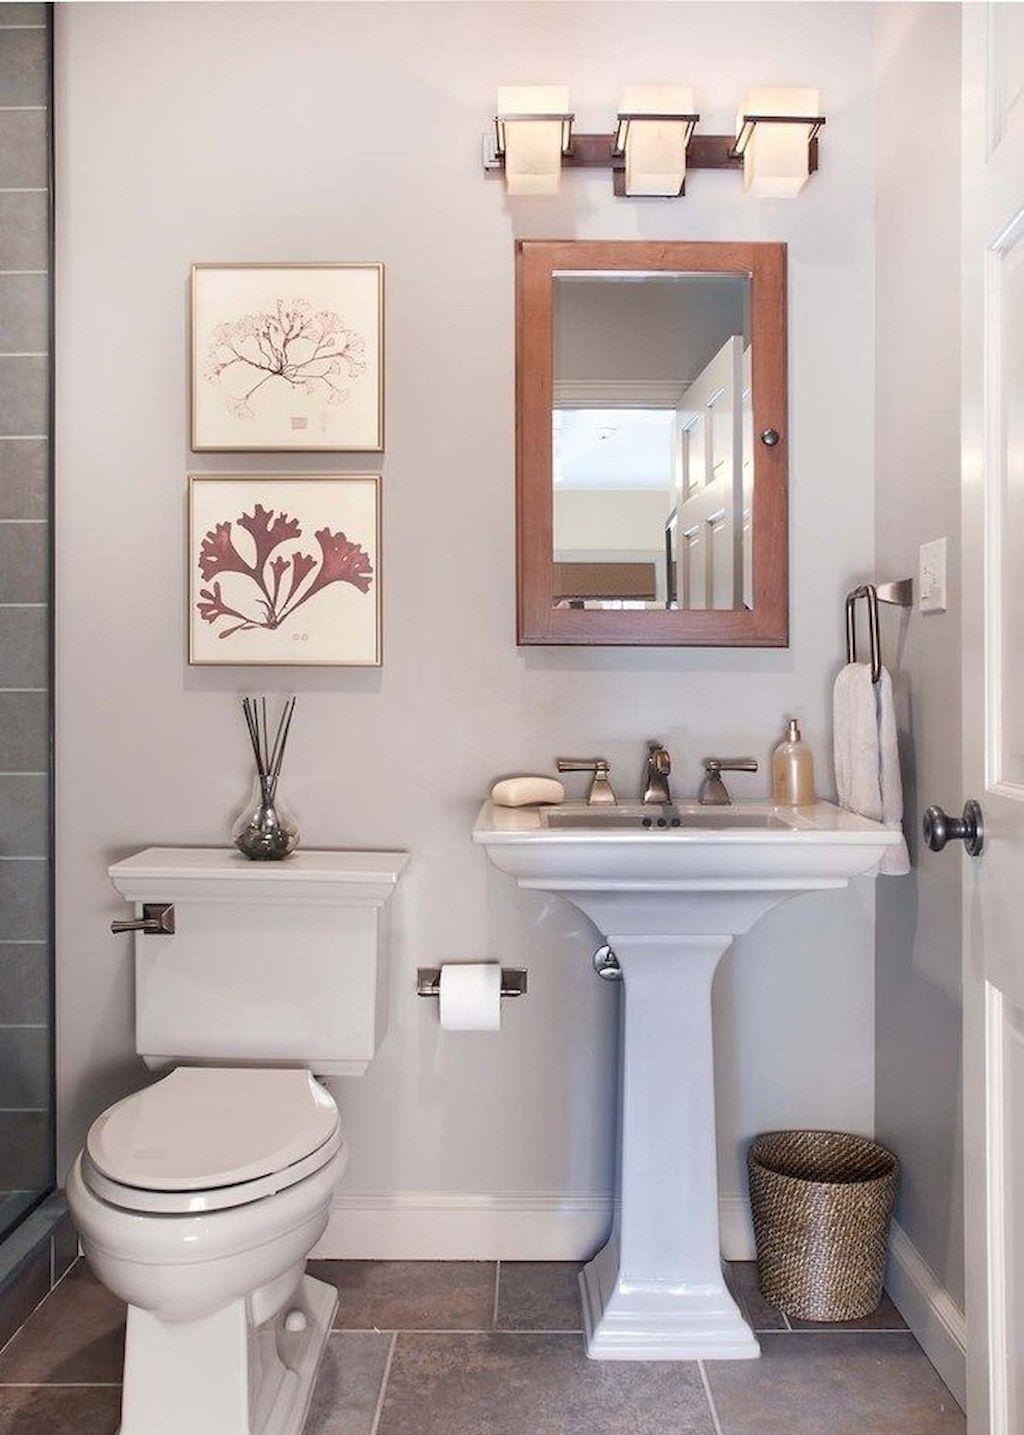 150 Amazing Small Farmhouse Bathroom Decor Ideas And ... on Nice Bathroom Designs For Small Spaces  id=23380